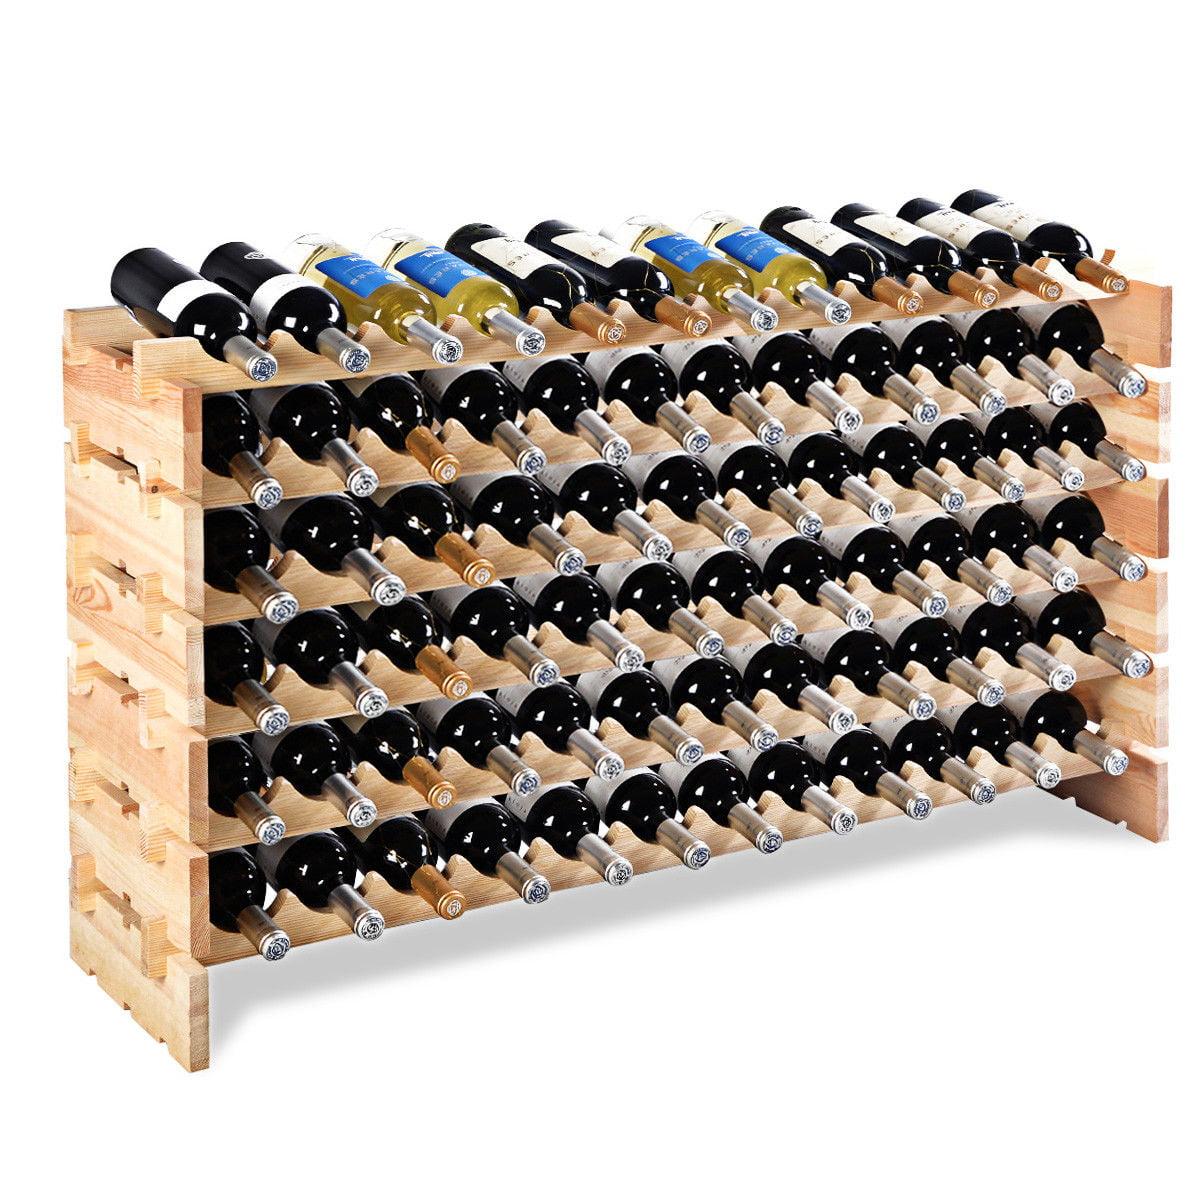 Costway 72 Bottle Wood Wine Rack Stackable Storage 6 Tier Storage Display Shelves